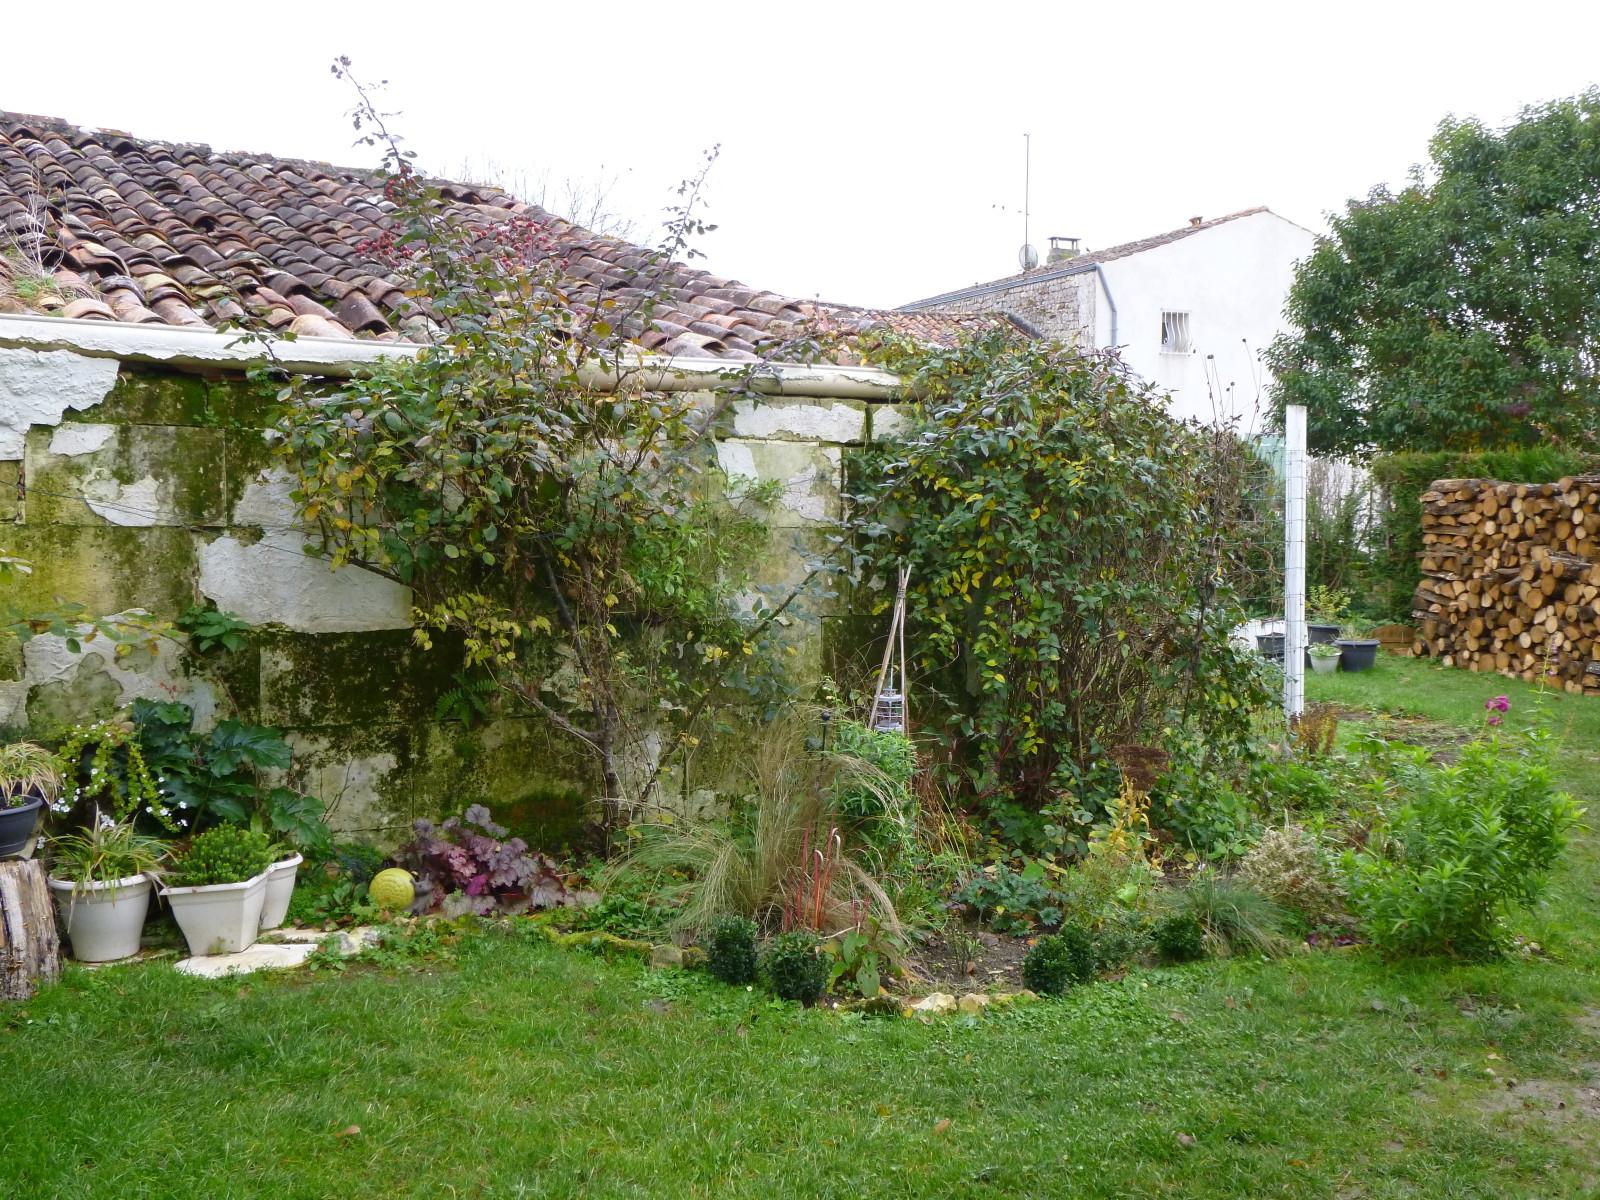 Arbre Aux Gentianes Jardiland Meilleur De Photos Cagouille S Garden Cagouille S Garden C Est Mon Petit Jardin